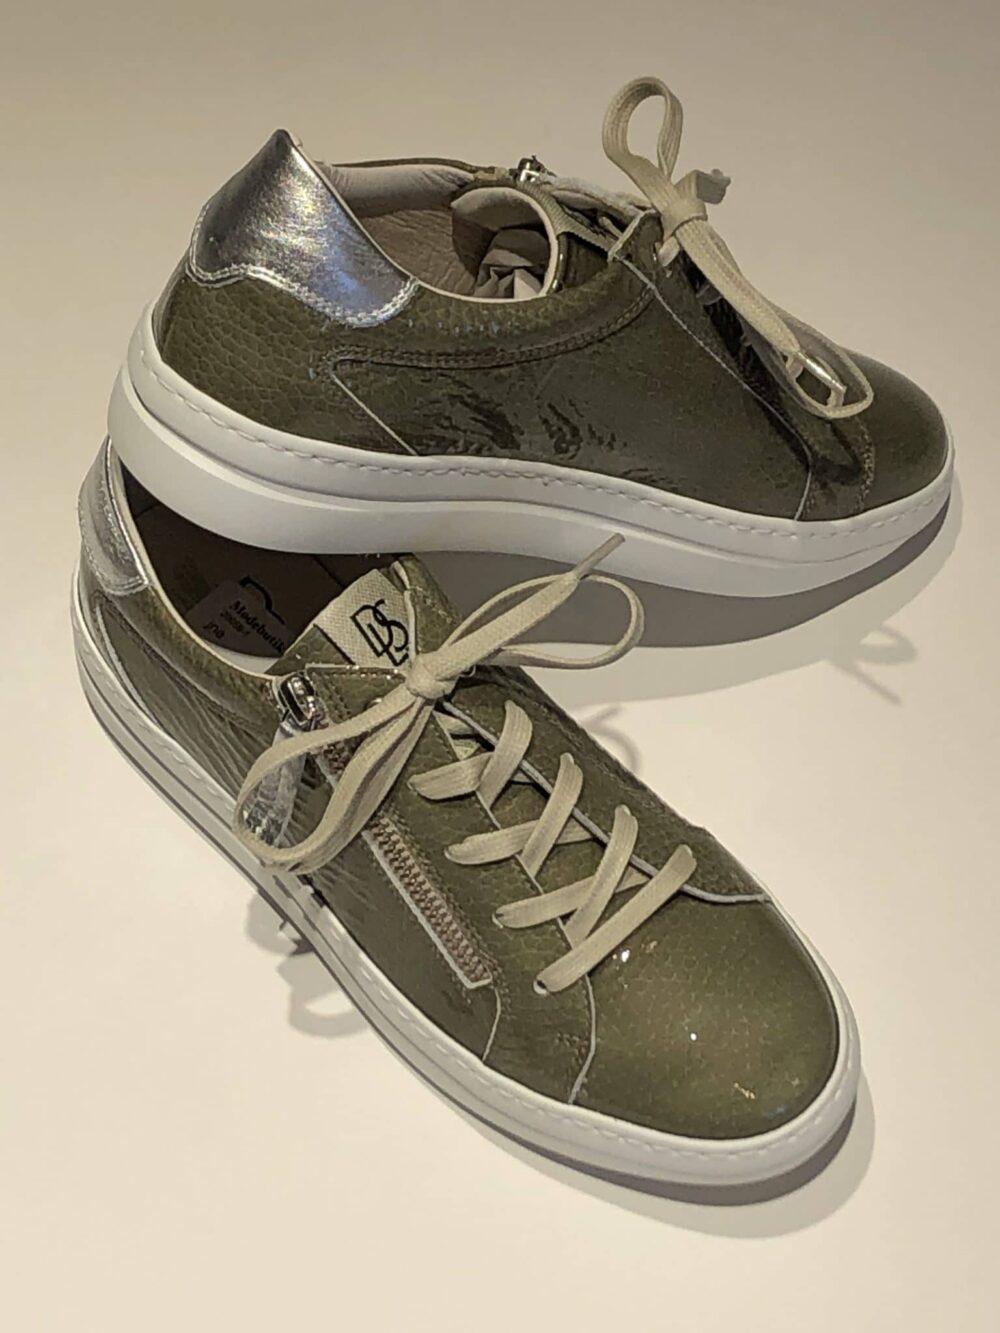 DLsport sneakers Gomma 4603 09 sweden olivia polaris argento scaled